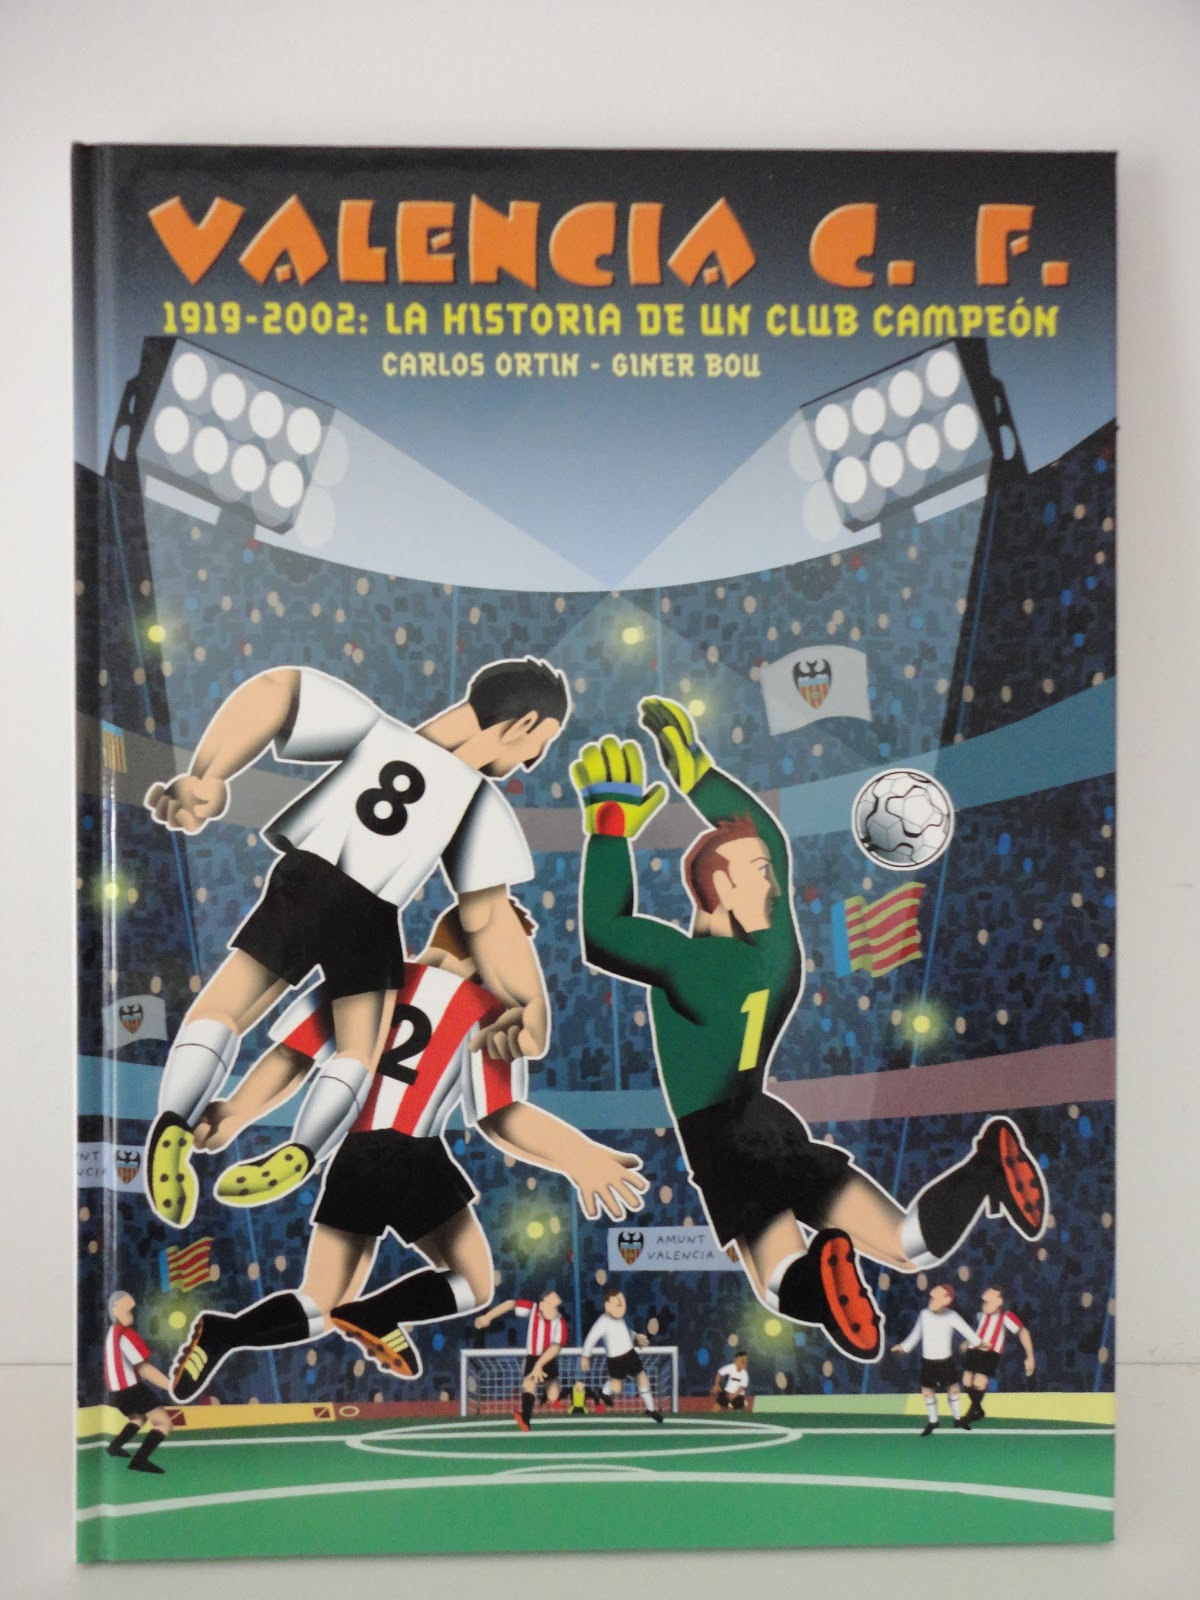 Pe a valencianista la figuera valencia c f 1919 2002 for Oficinas valencia cf